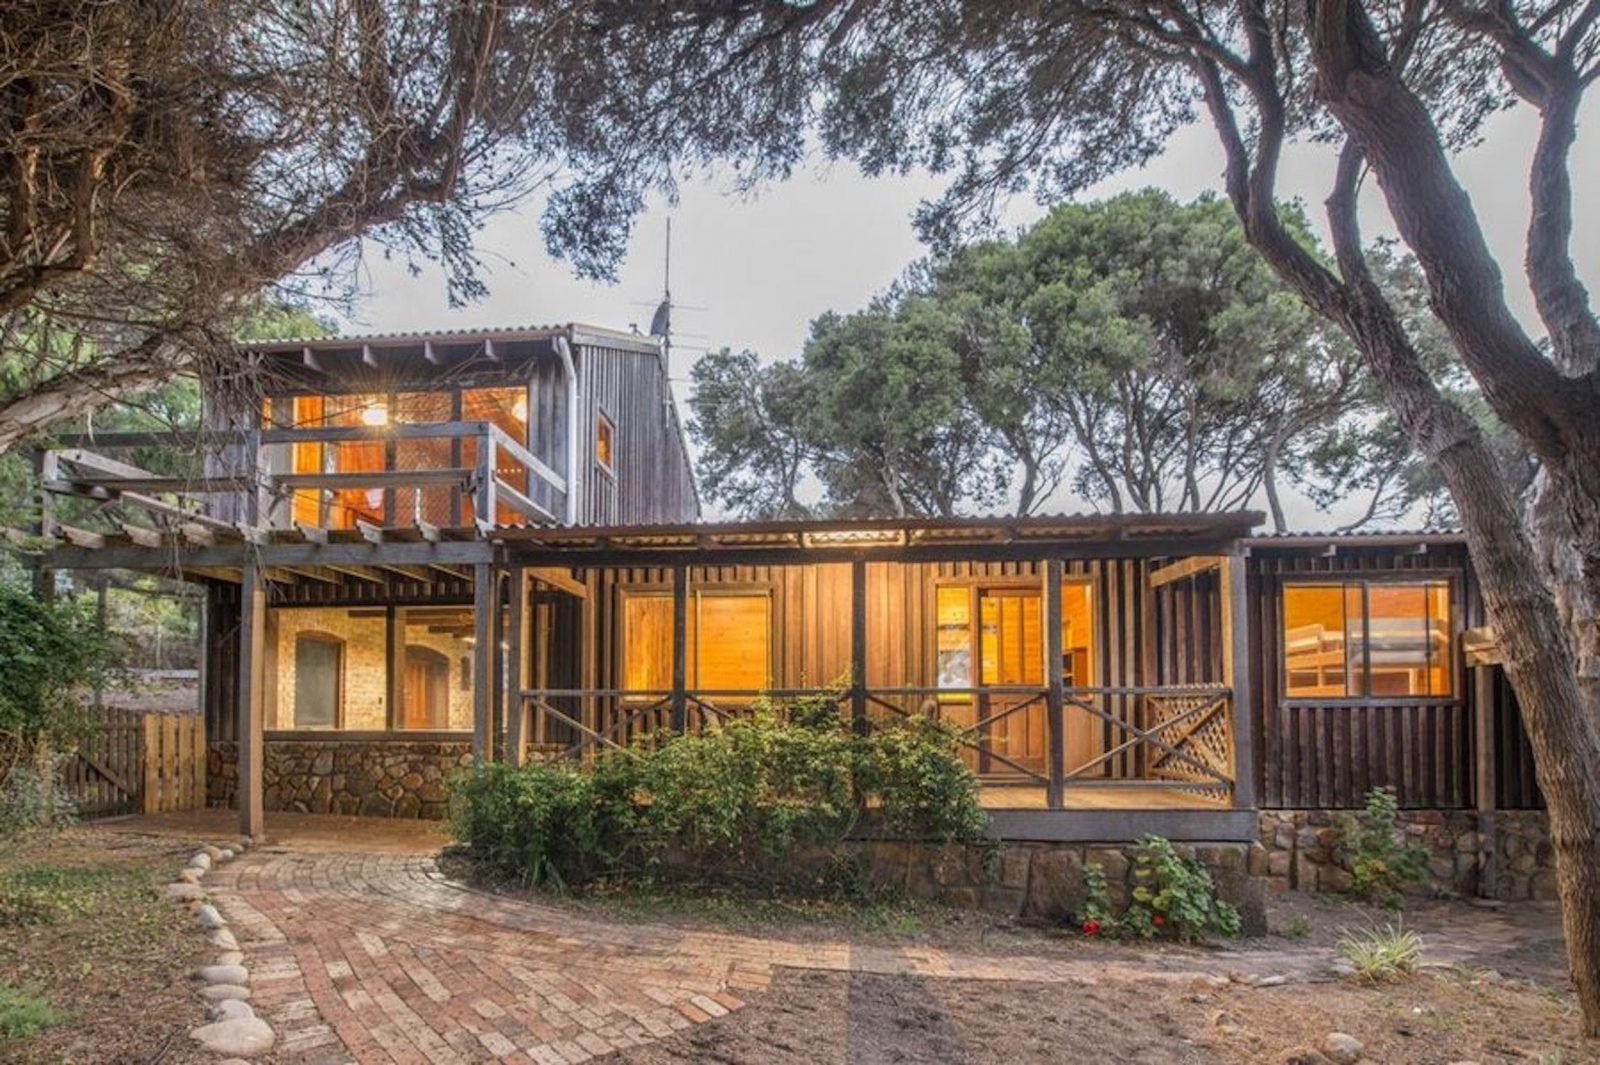 Yallingup Beach House, Yallingup, Western Australia